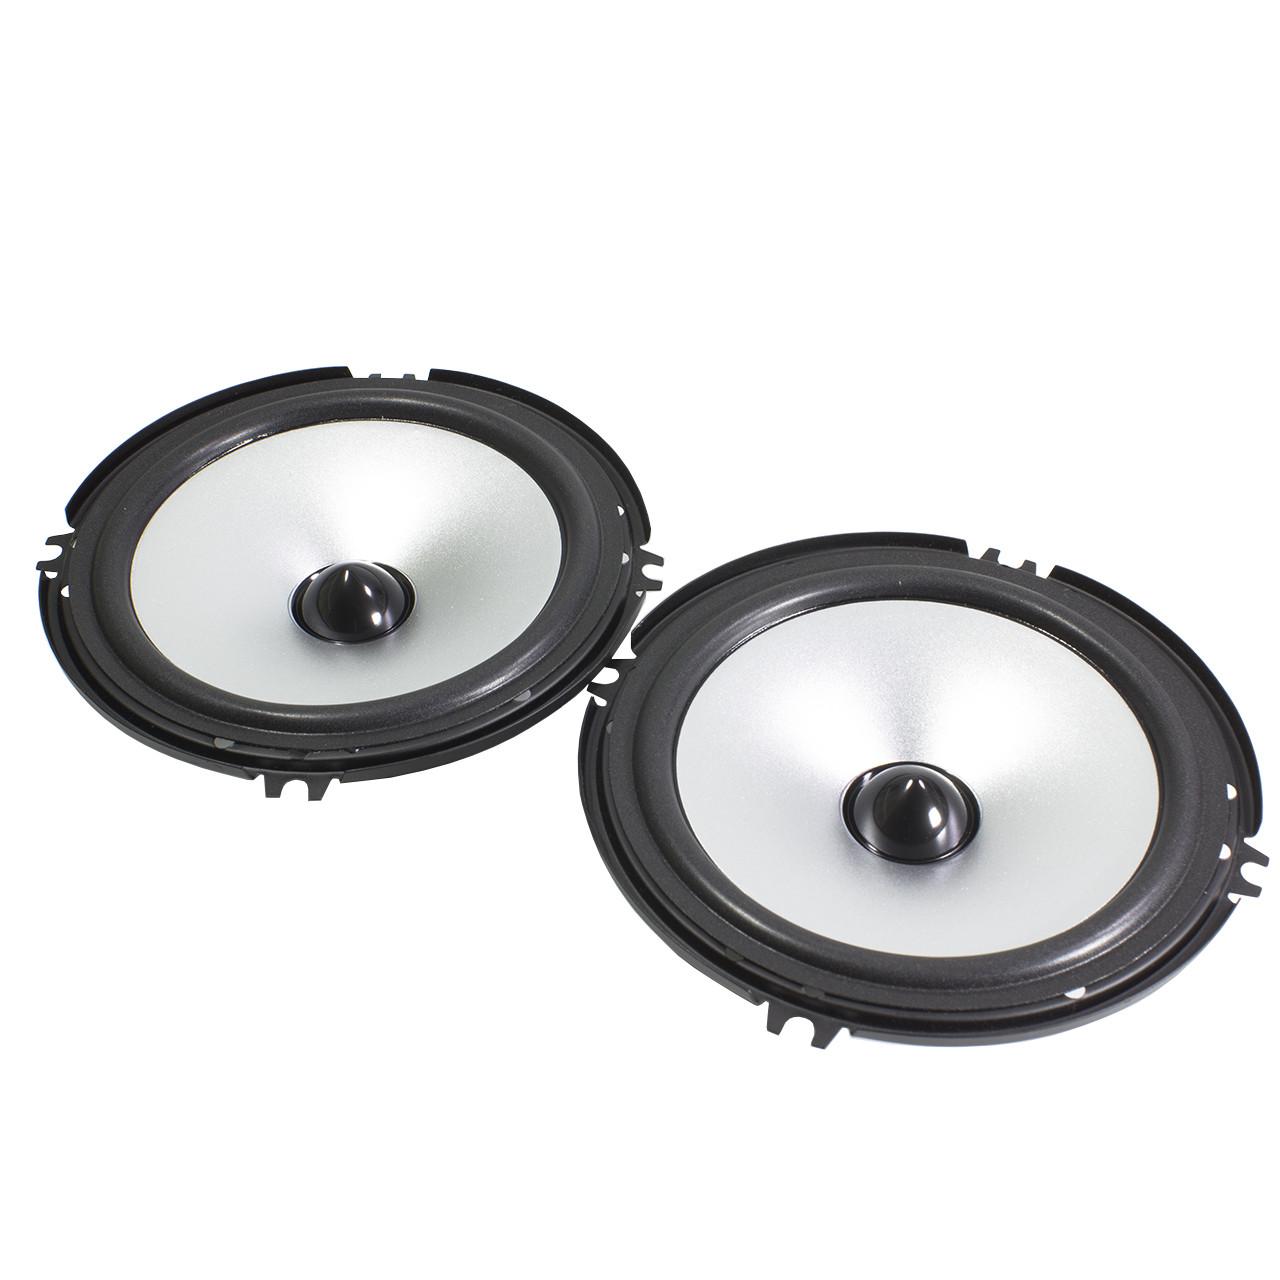 Купить Автомобильная акустика, Автоакустика Labo LB-PS1651D 60 Вт 2399-7396, КОД: 358731